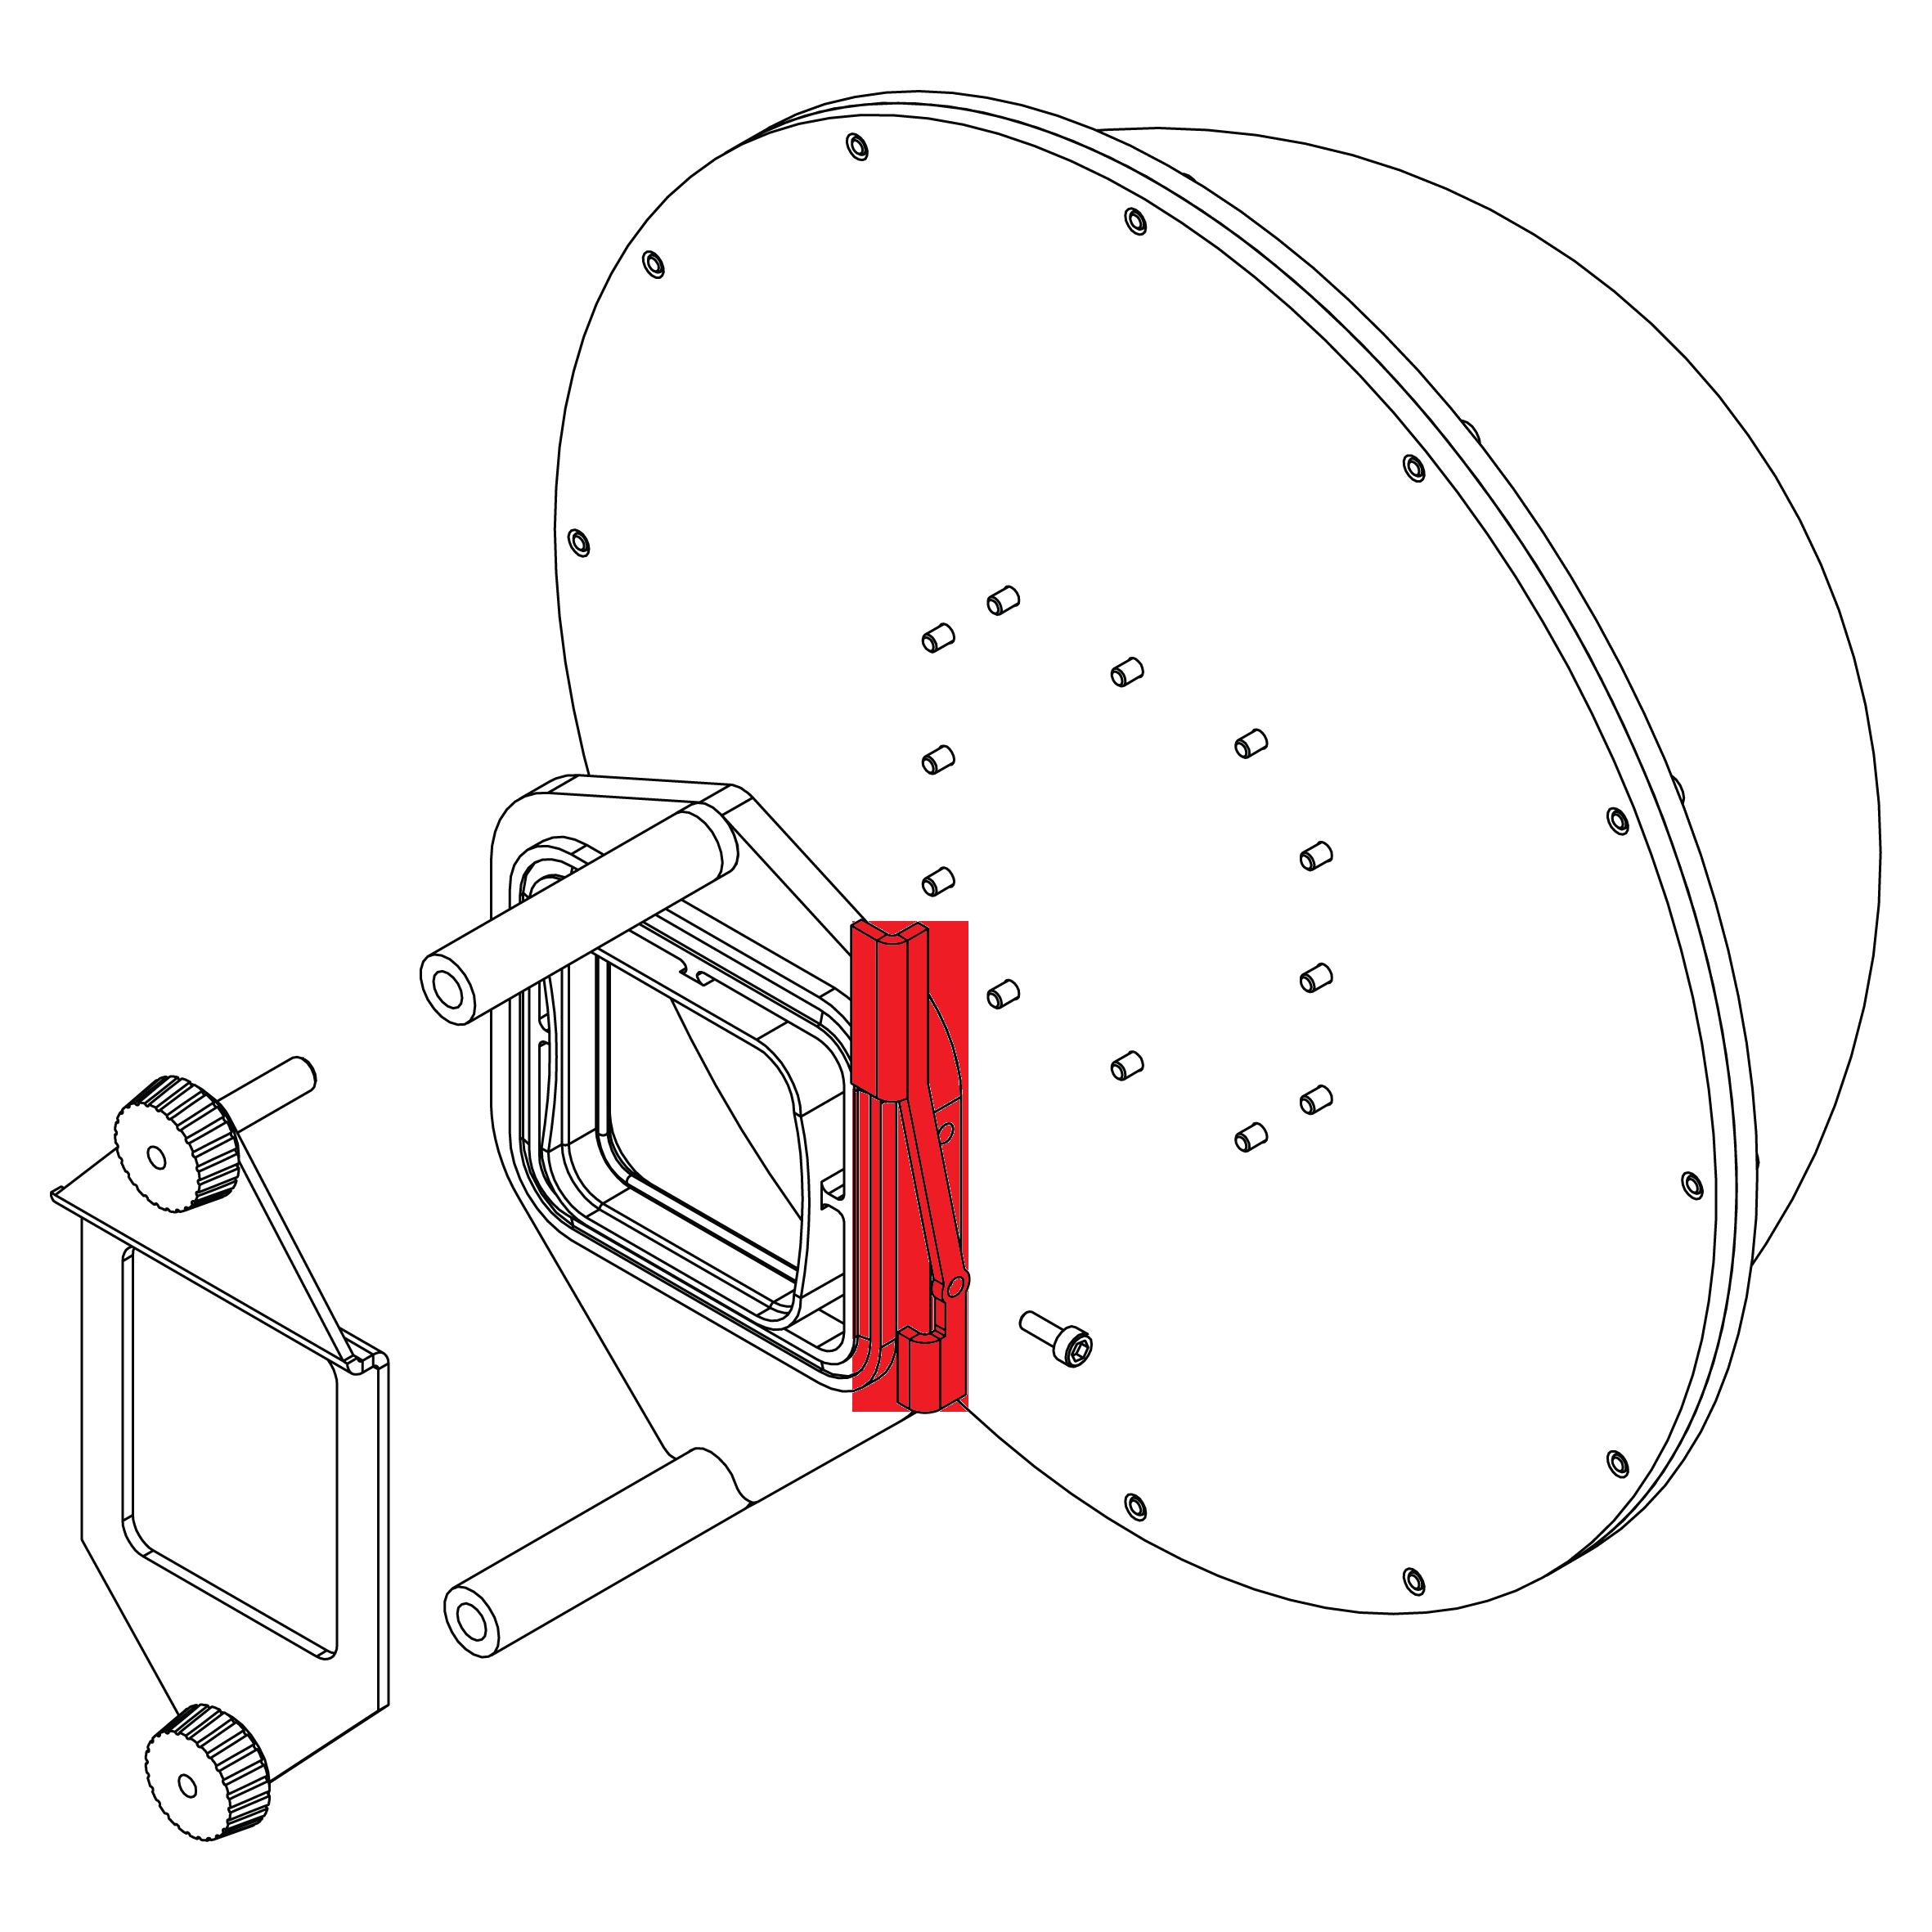 split shot dome - replacement camera dome button  u0026 screw - sjpro